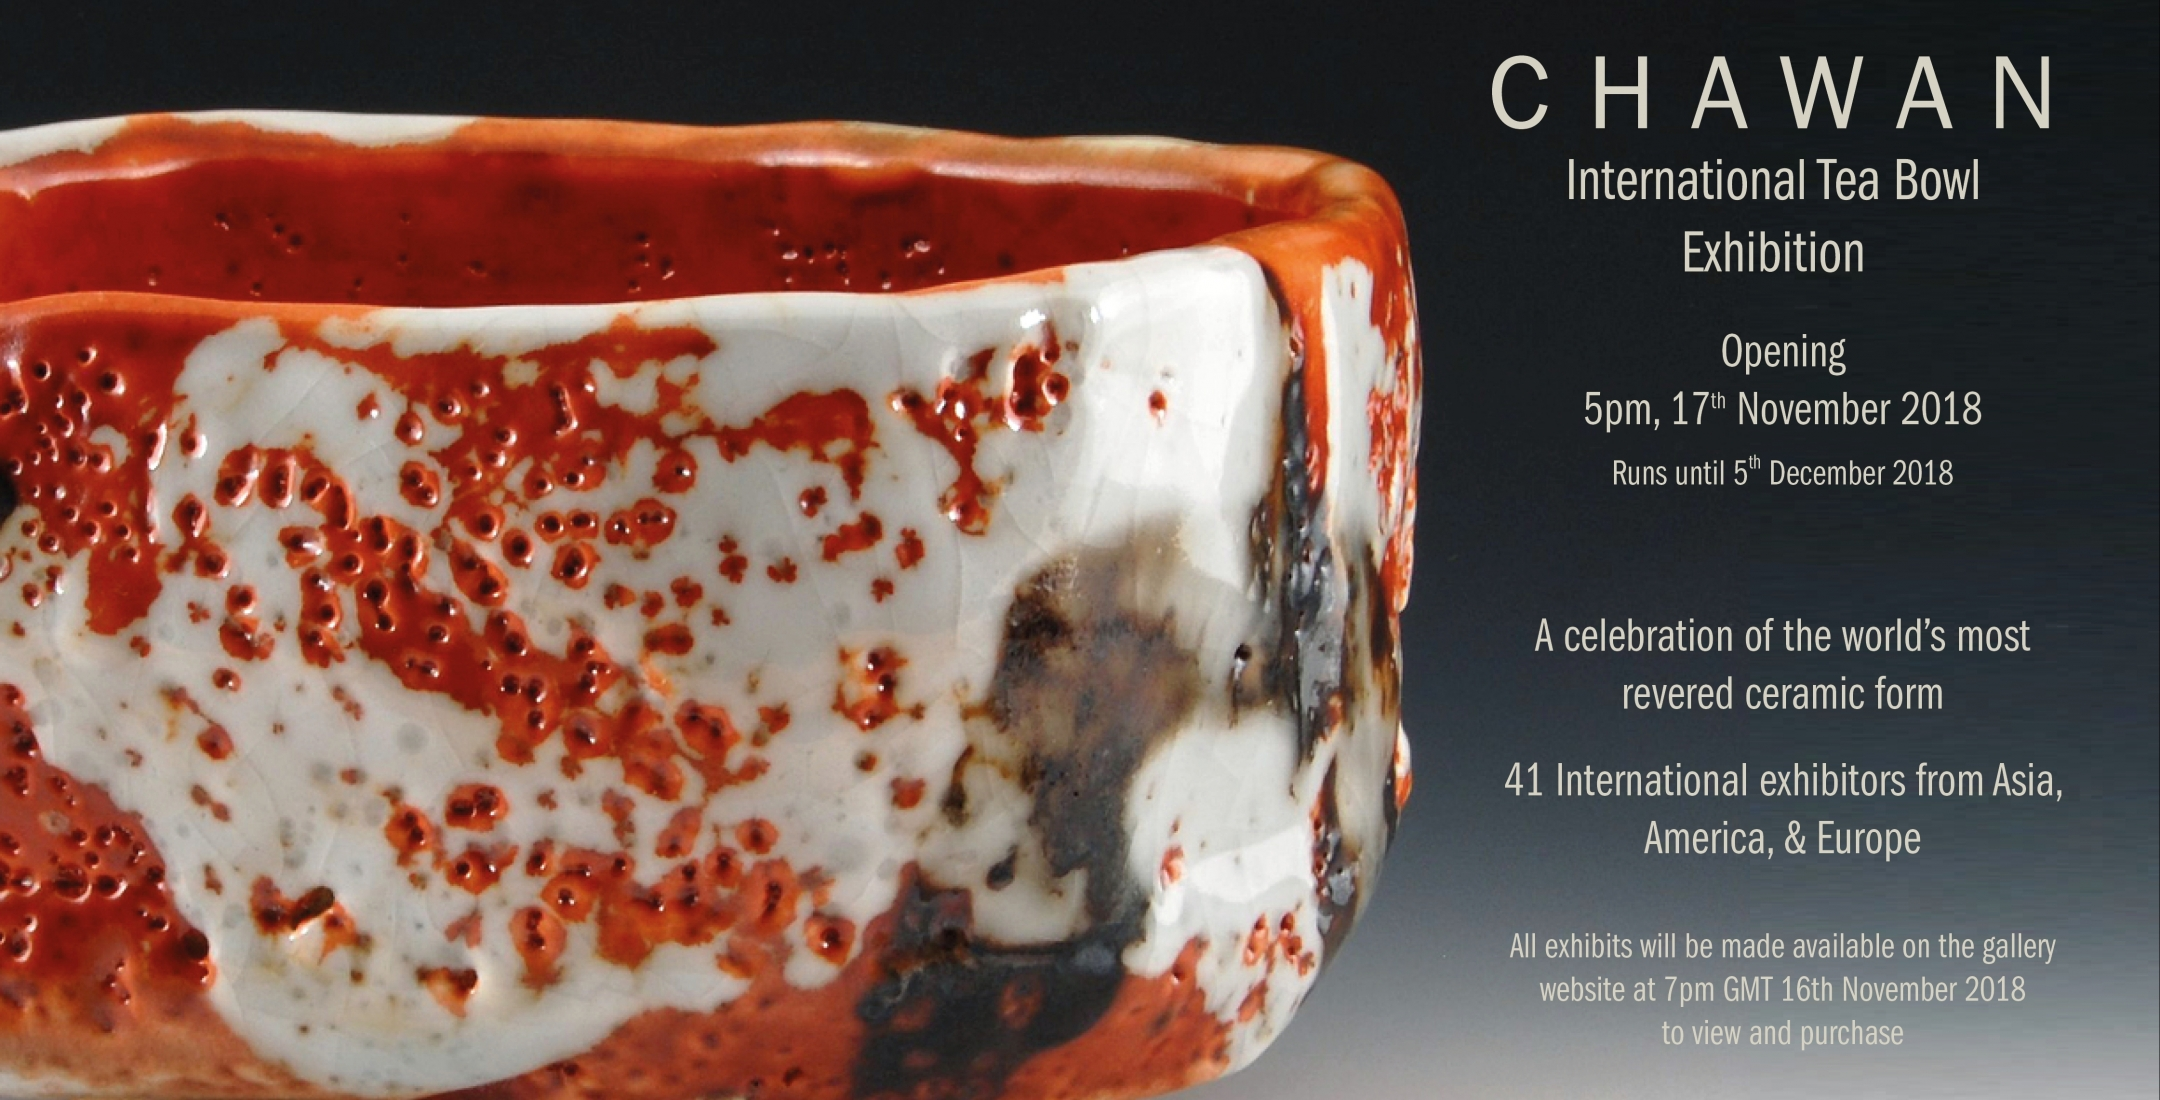 CHAWAN - International Teabowl Exhibition